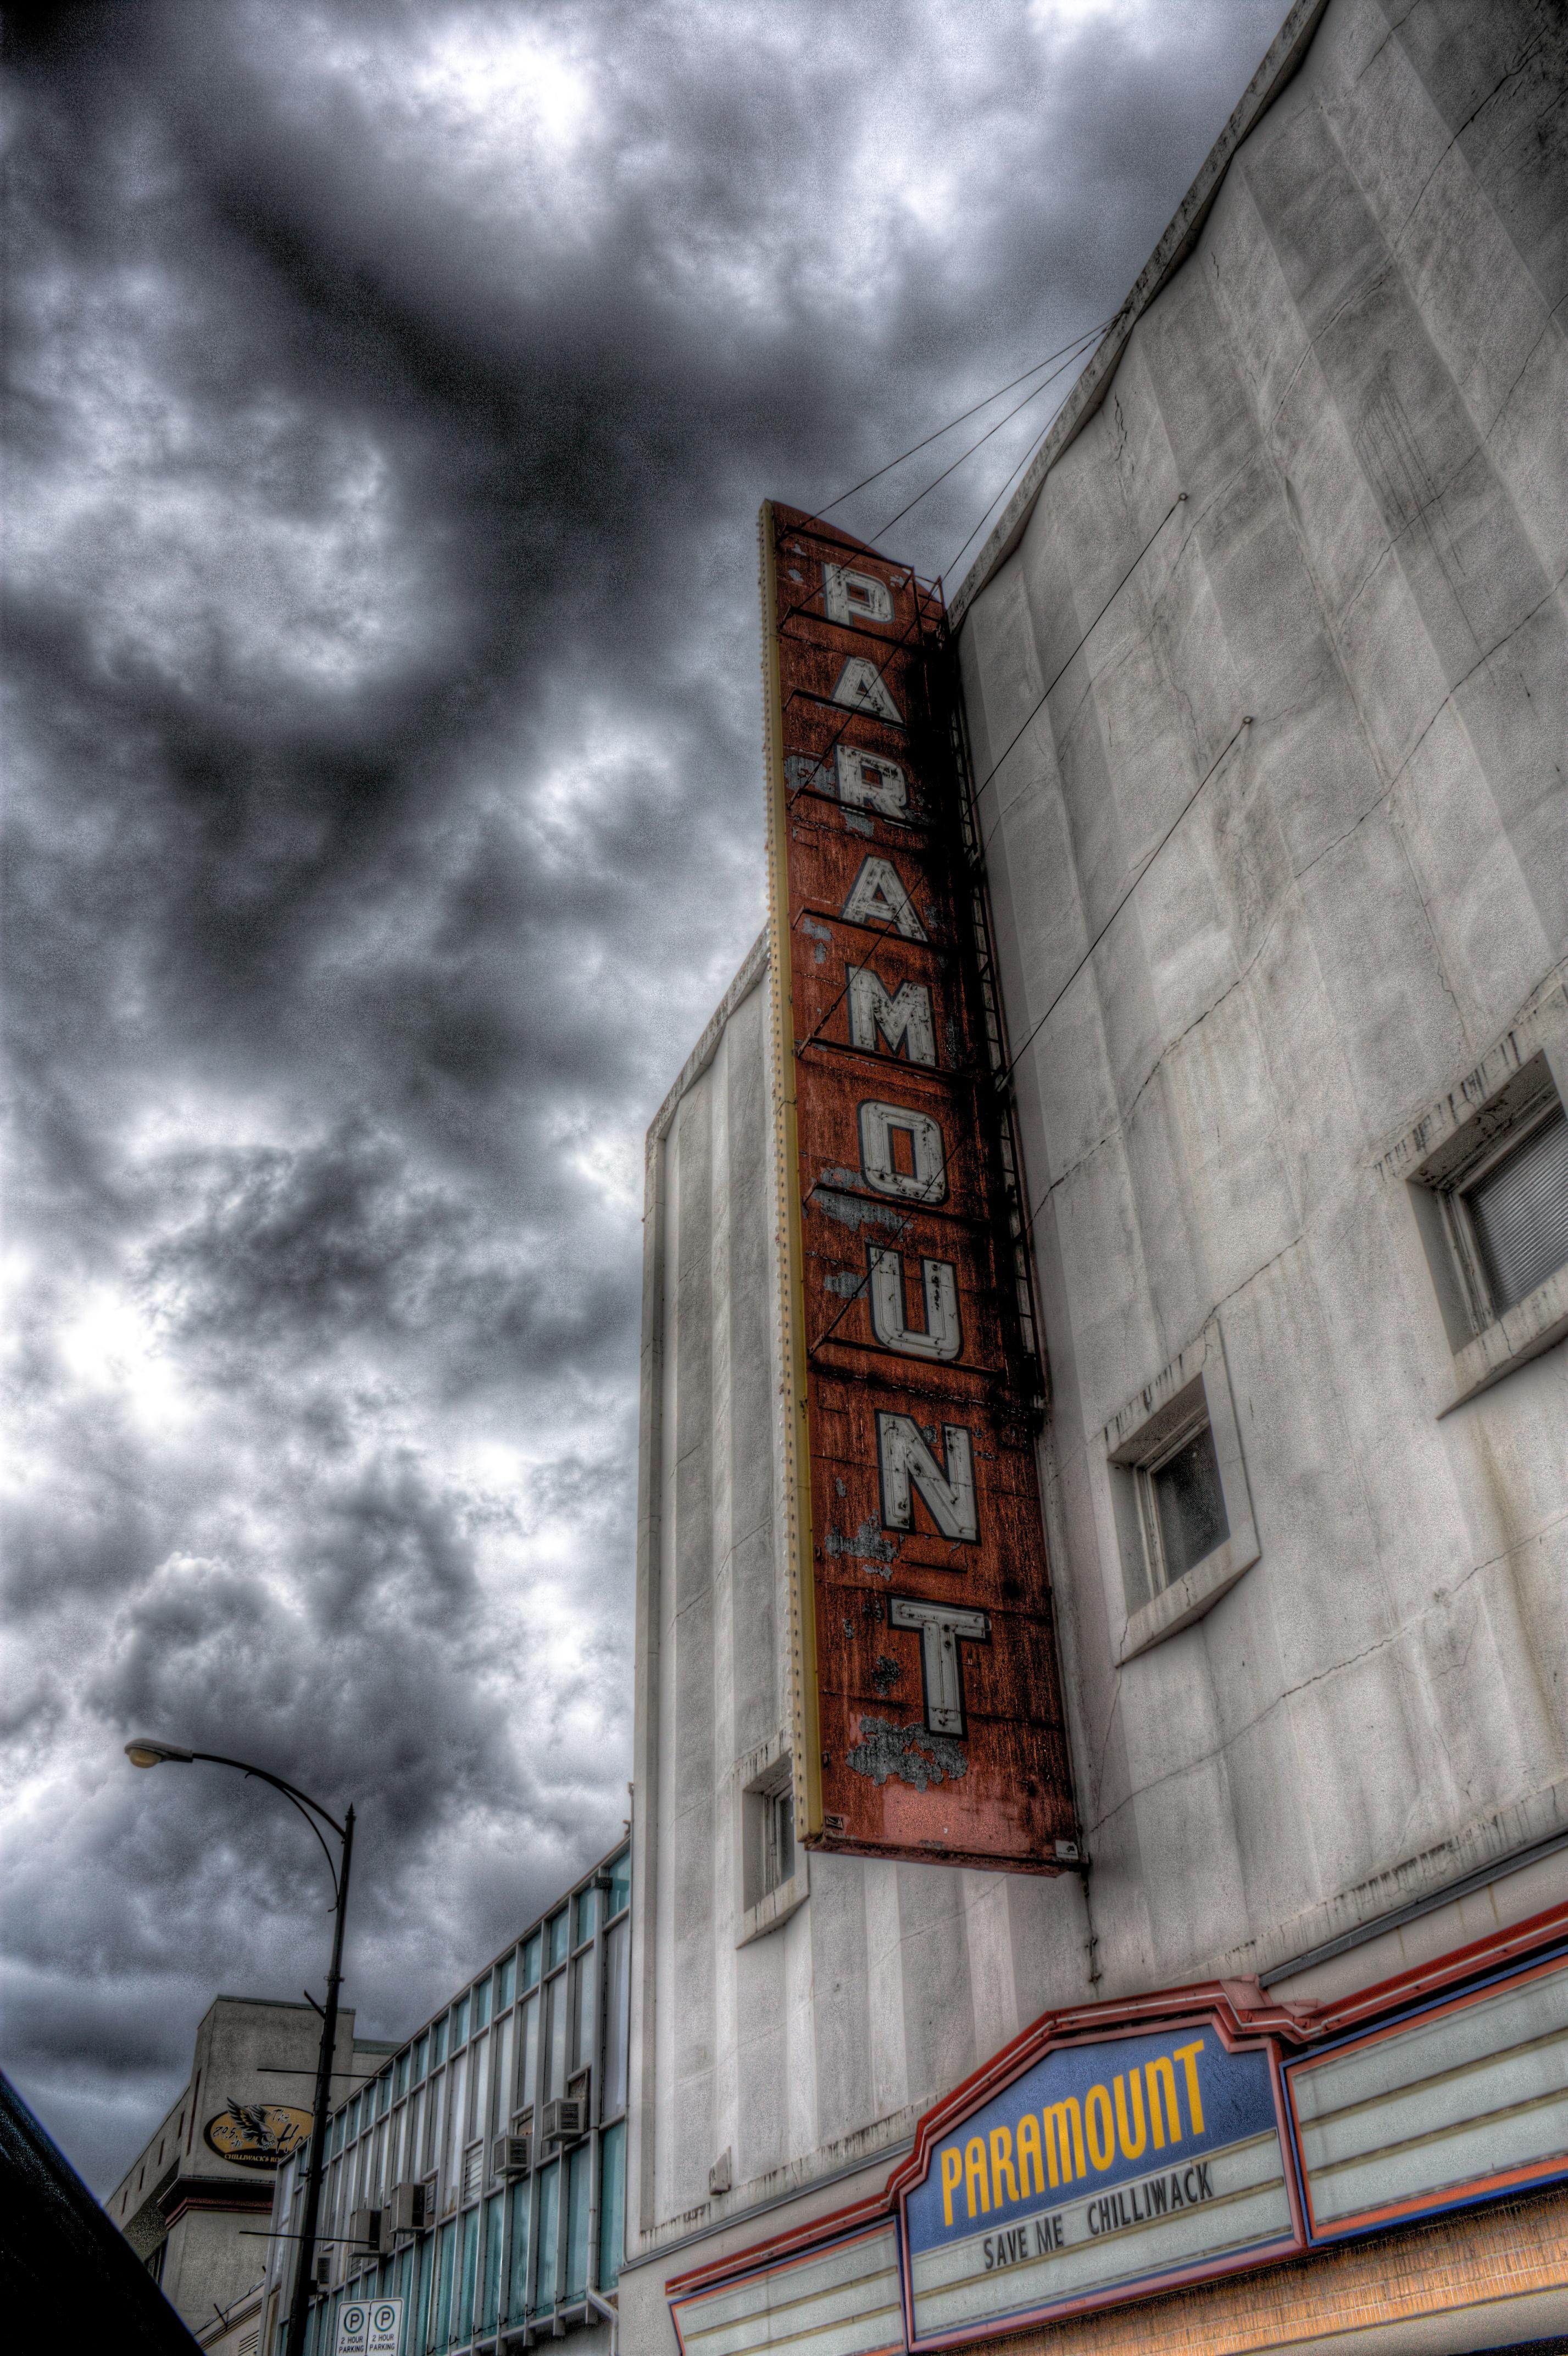 Paramount by jverm